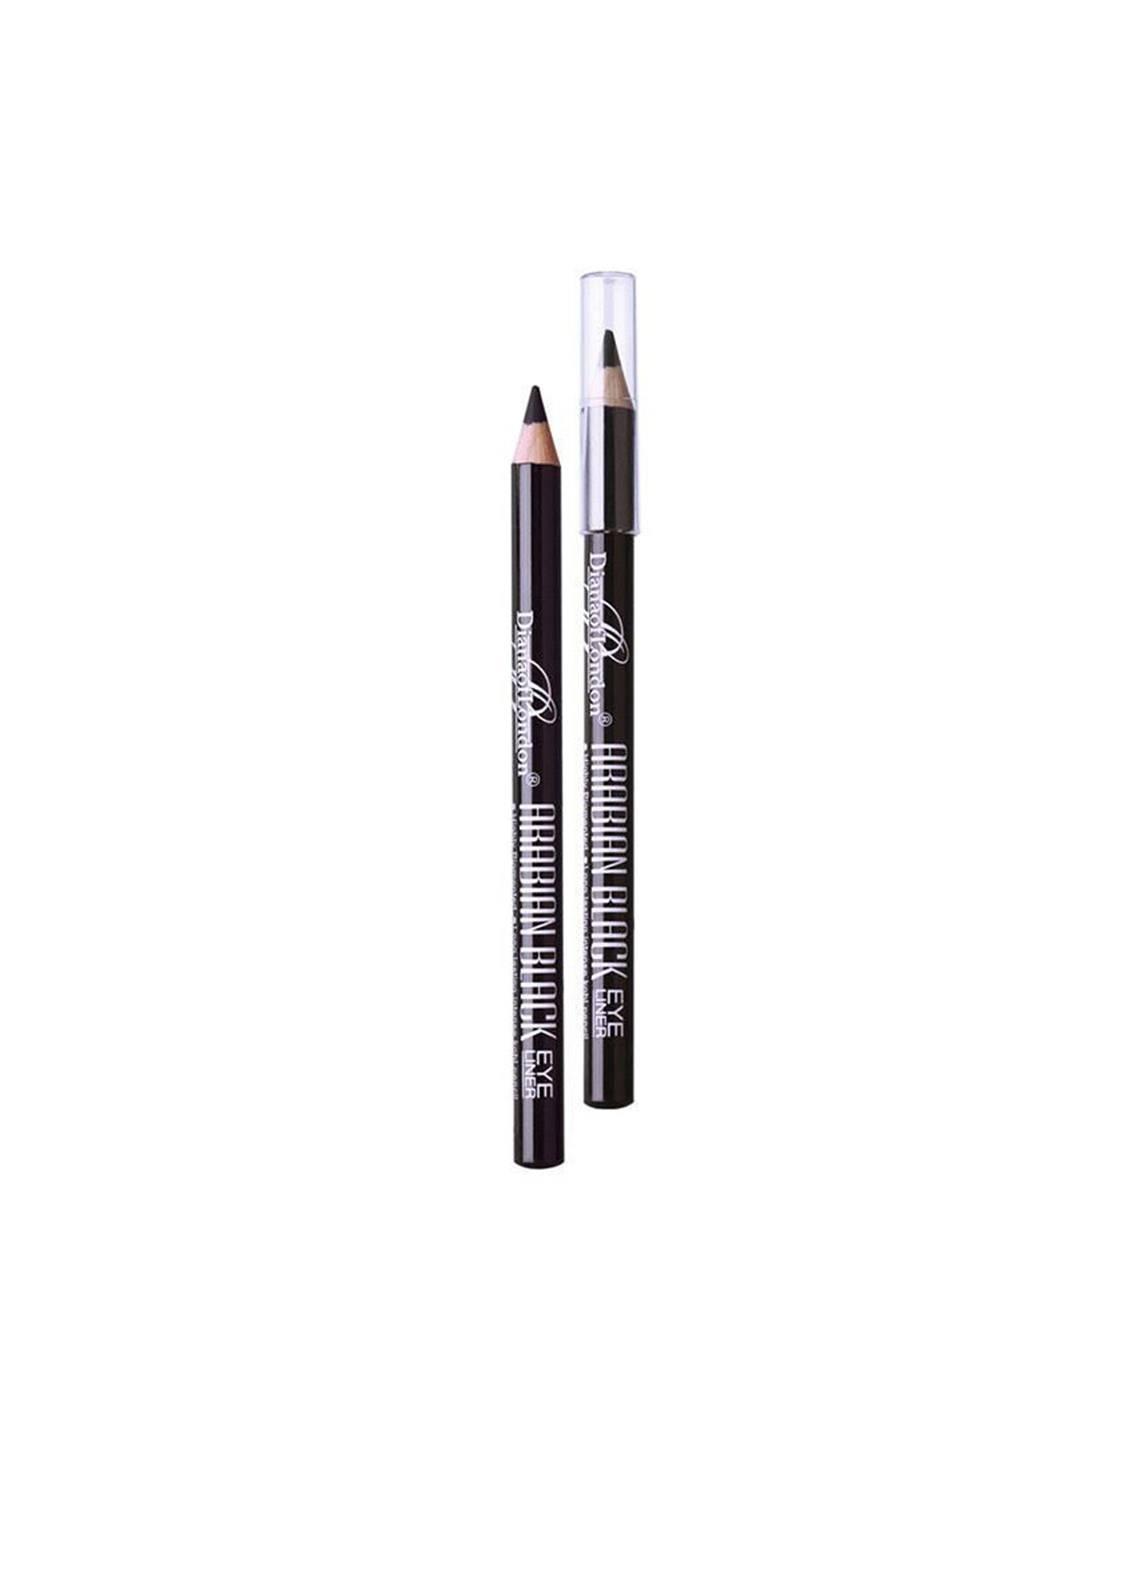 Diana Of London Arabian Night Pencil - Black